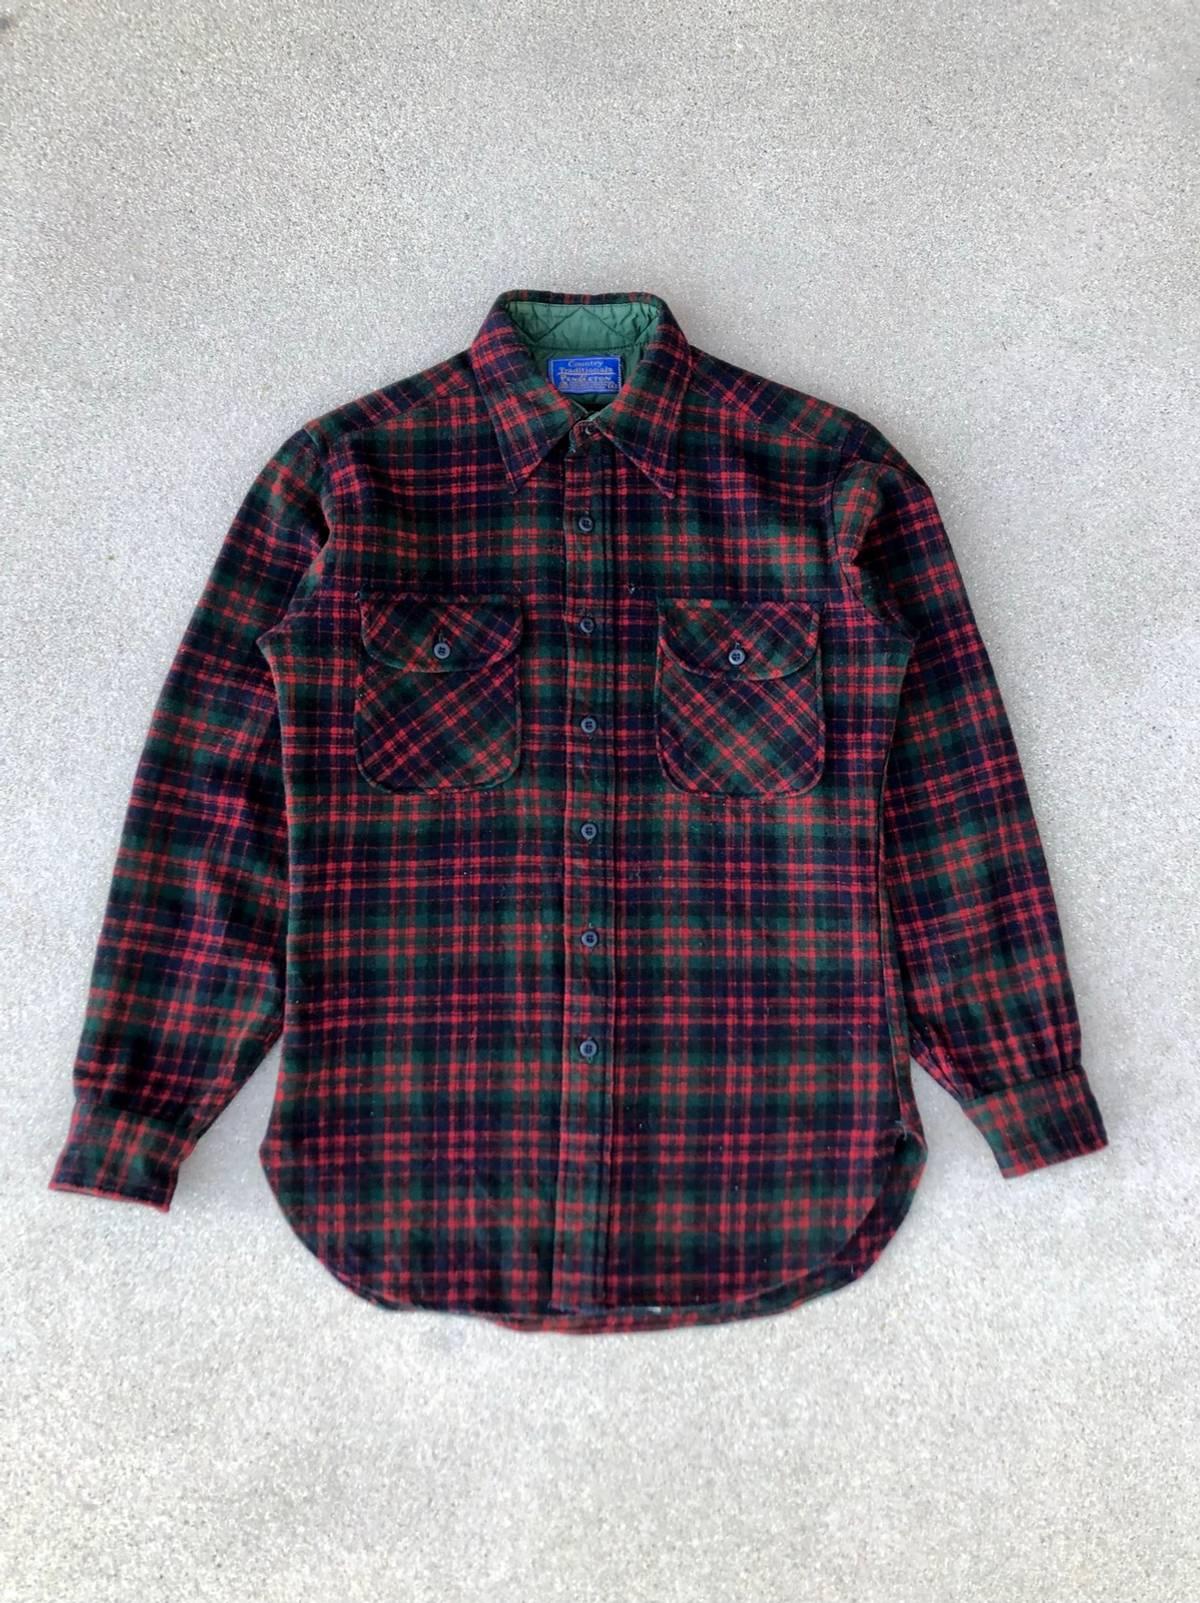 80s Pendleton Shirt  L  Light Weight  1980s  Plaid  Shadow Plaid  1980s Pendleton Shirt  Vintage Pendleton  Wool Shirt  80s Shirt